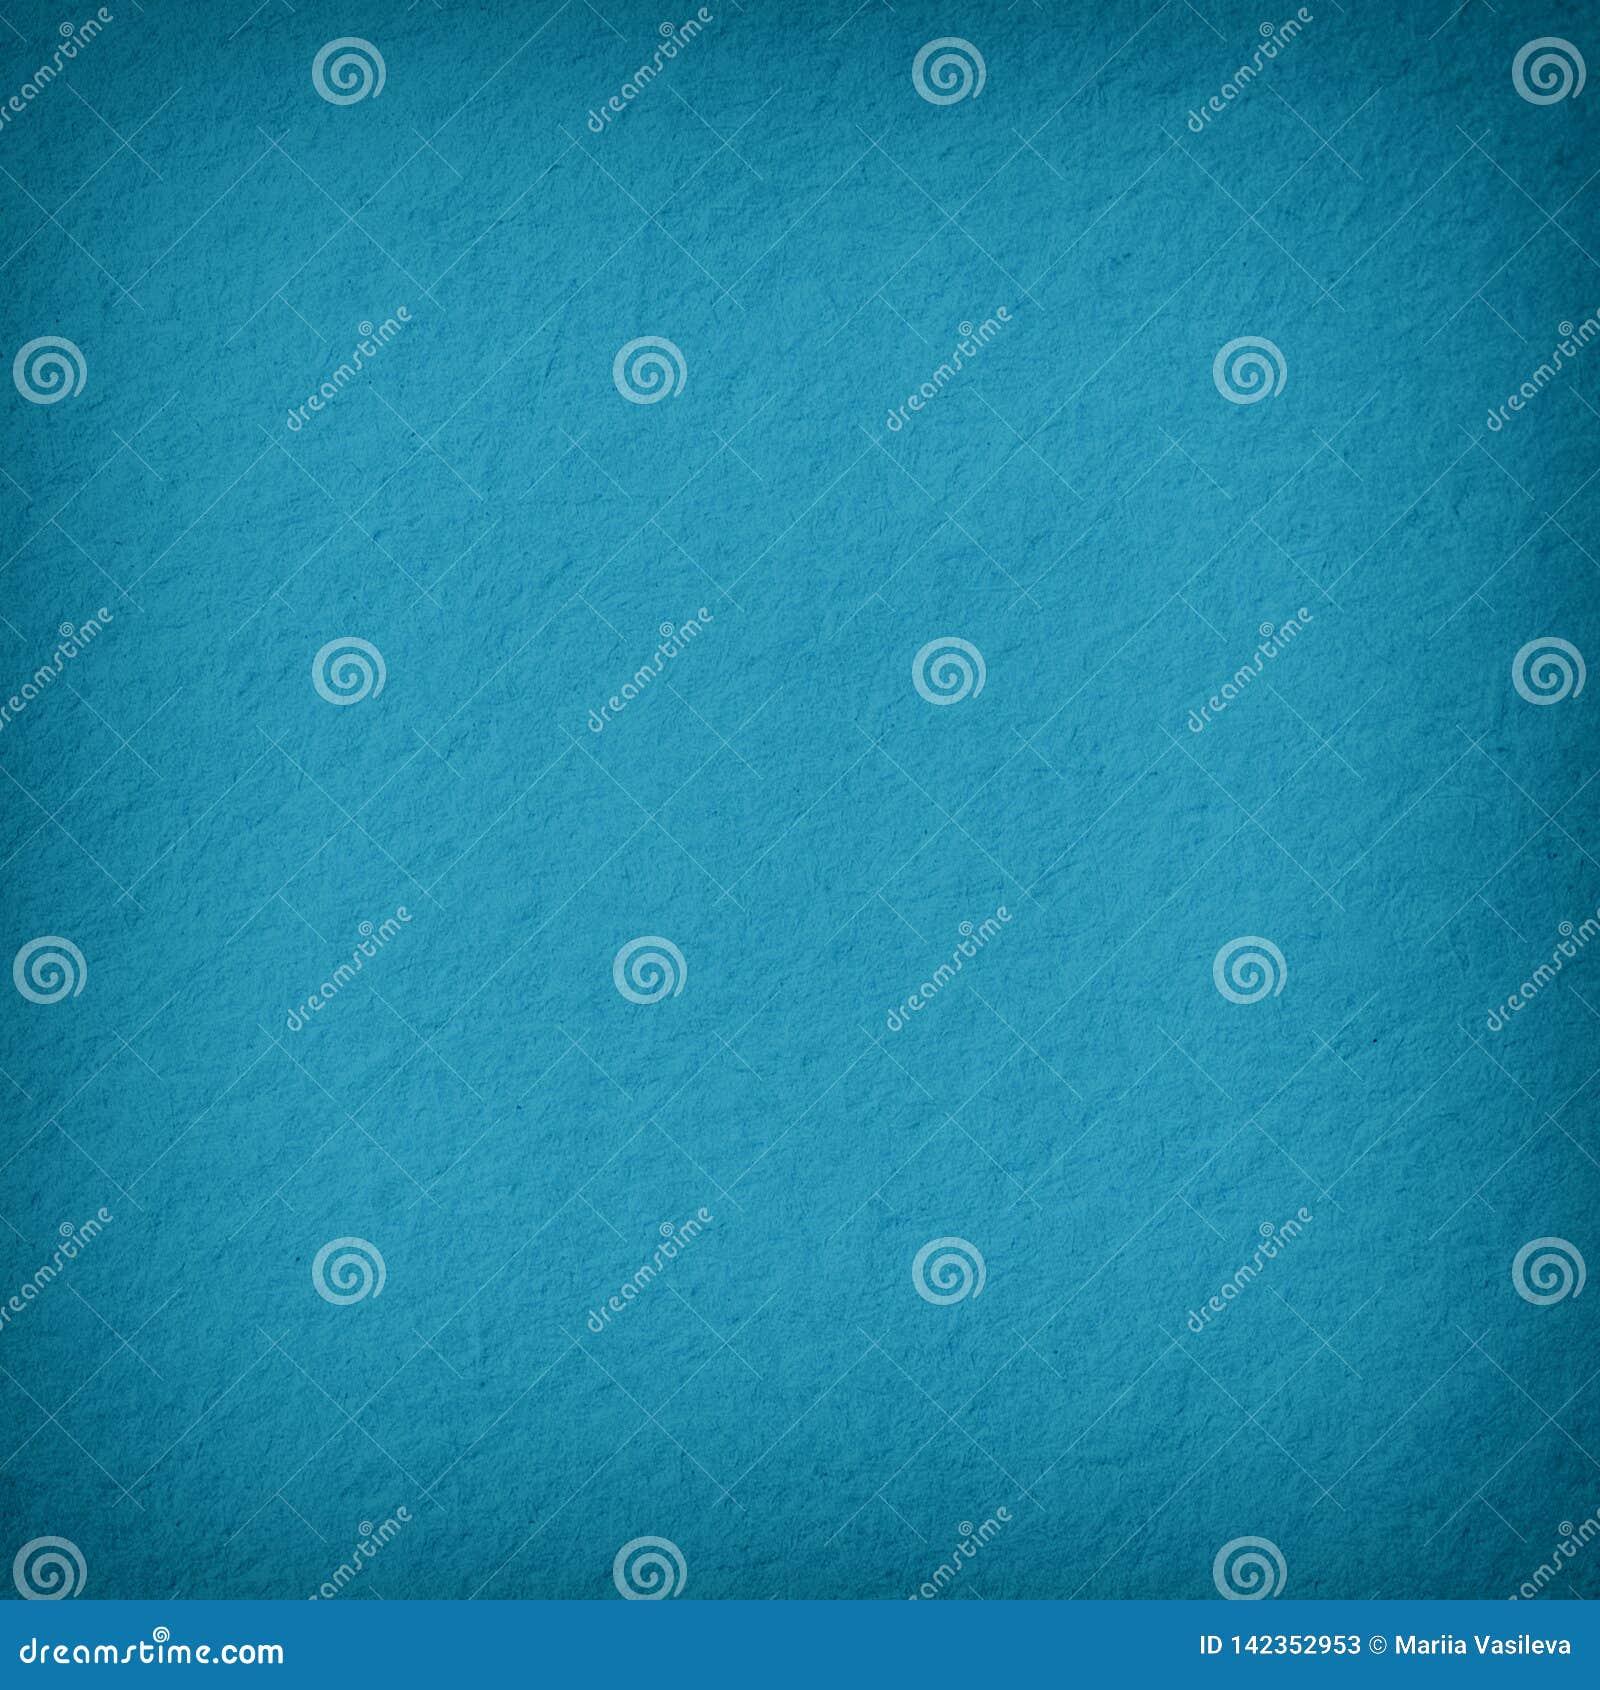 Blue Background Paper Texture Blank Vintage Retro Rough